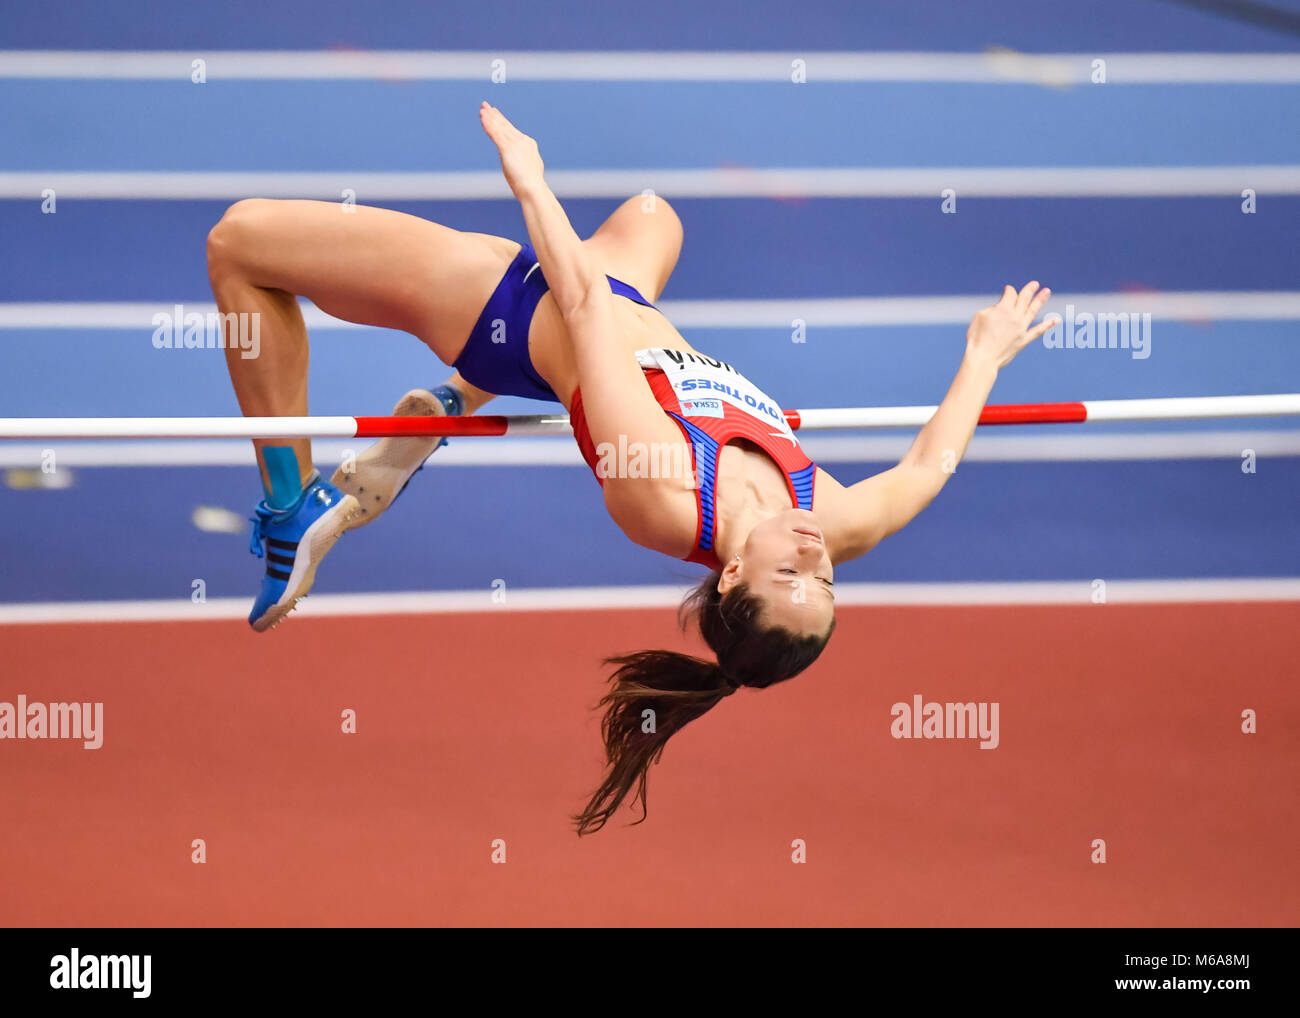 Birmingham, UK. 2nd March, 2018. Birmingham, UK. 2nd Mar, 2018. Katerina Cachova in Women's High Jump Pentathlon - Stock Image